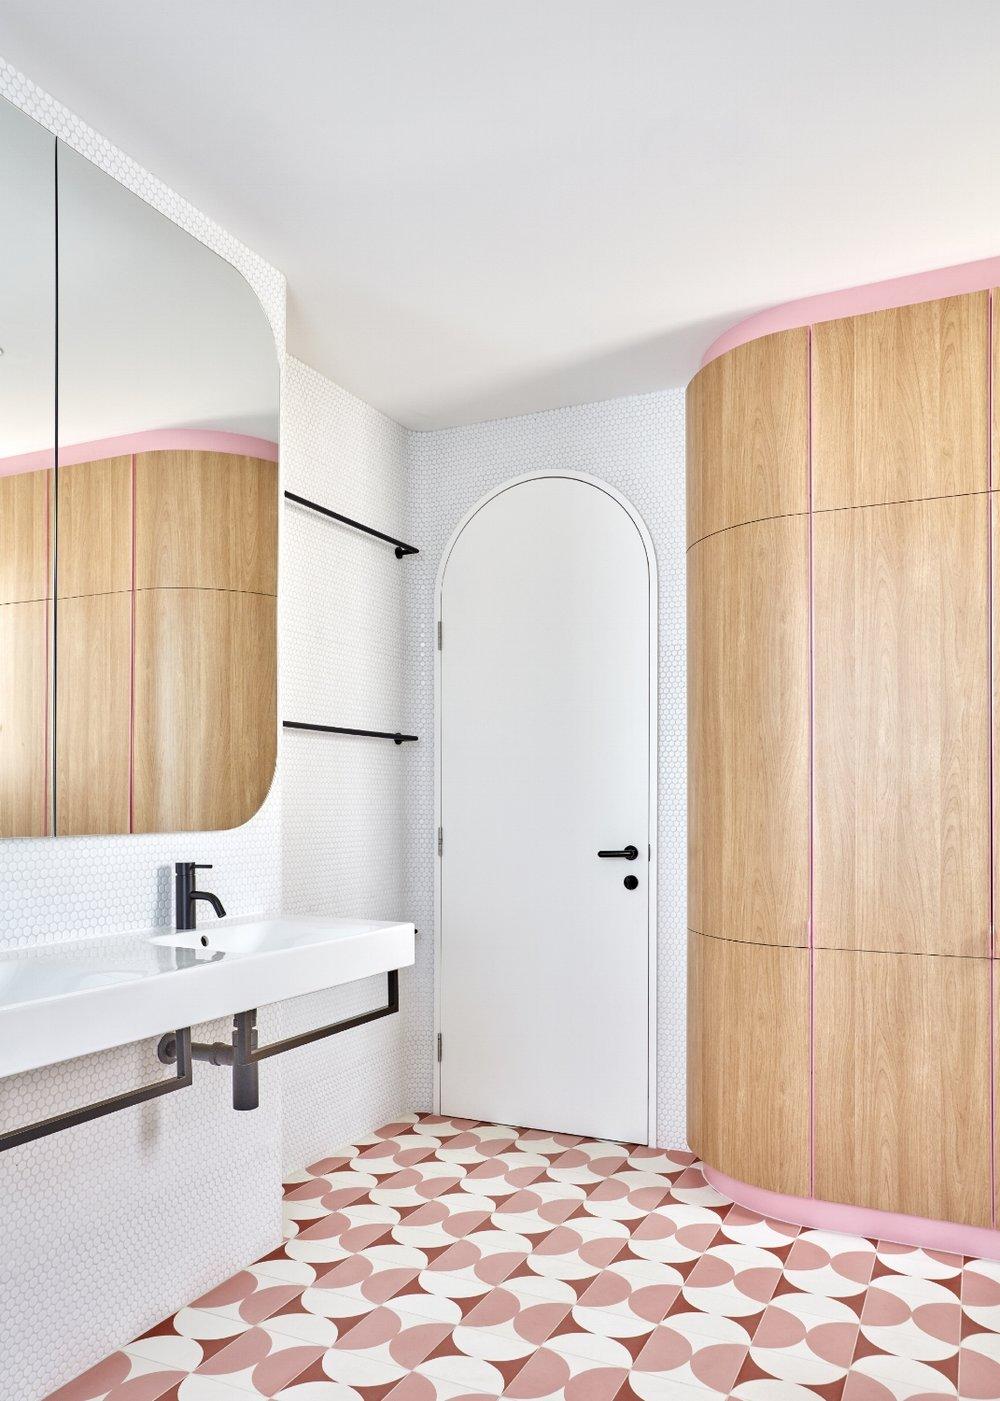 bagno senza spigoli bianco e rosa piastrelle anni 60-70